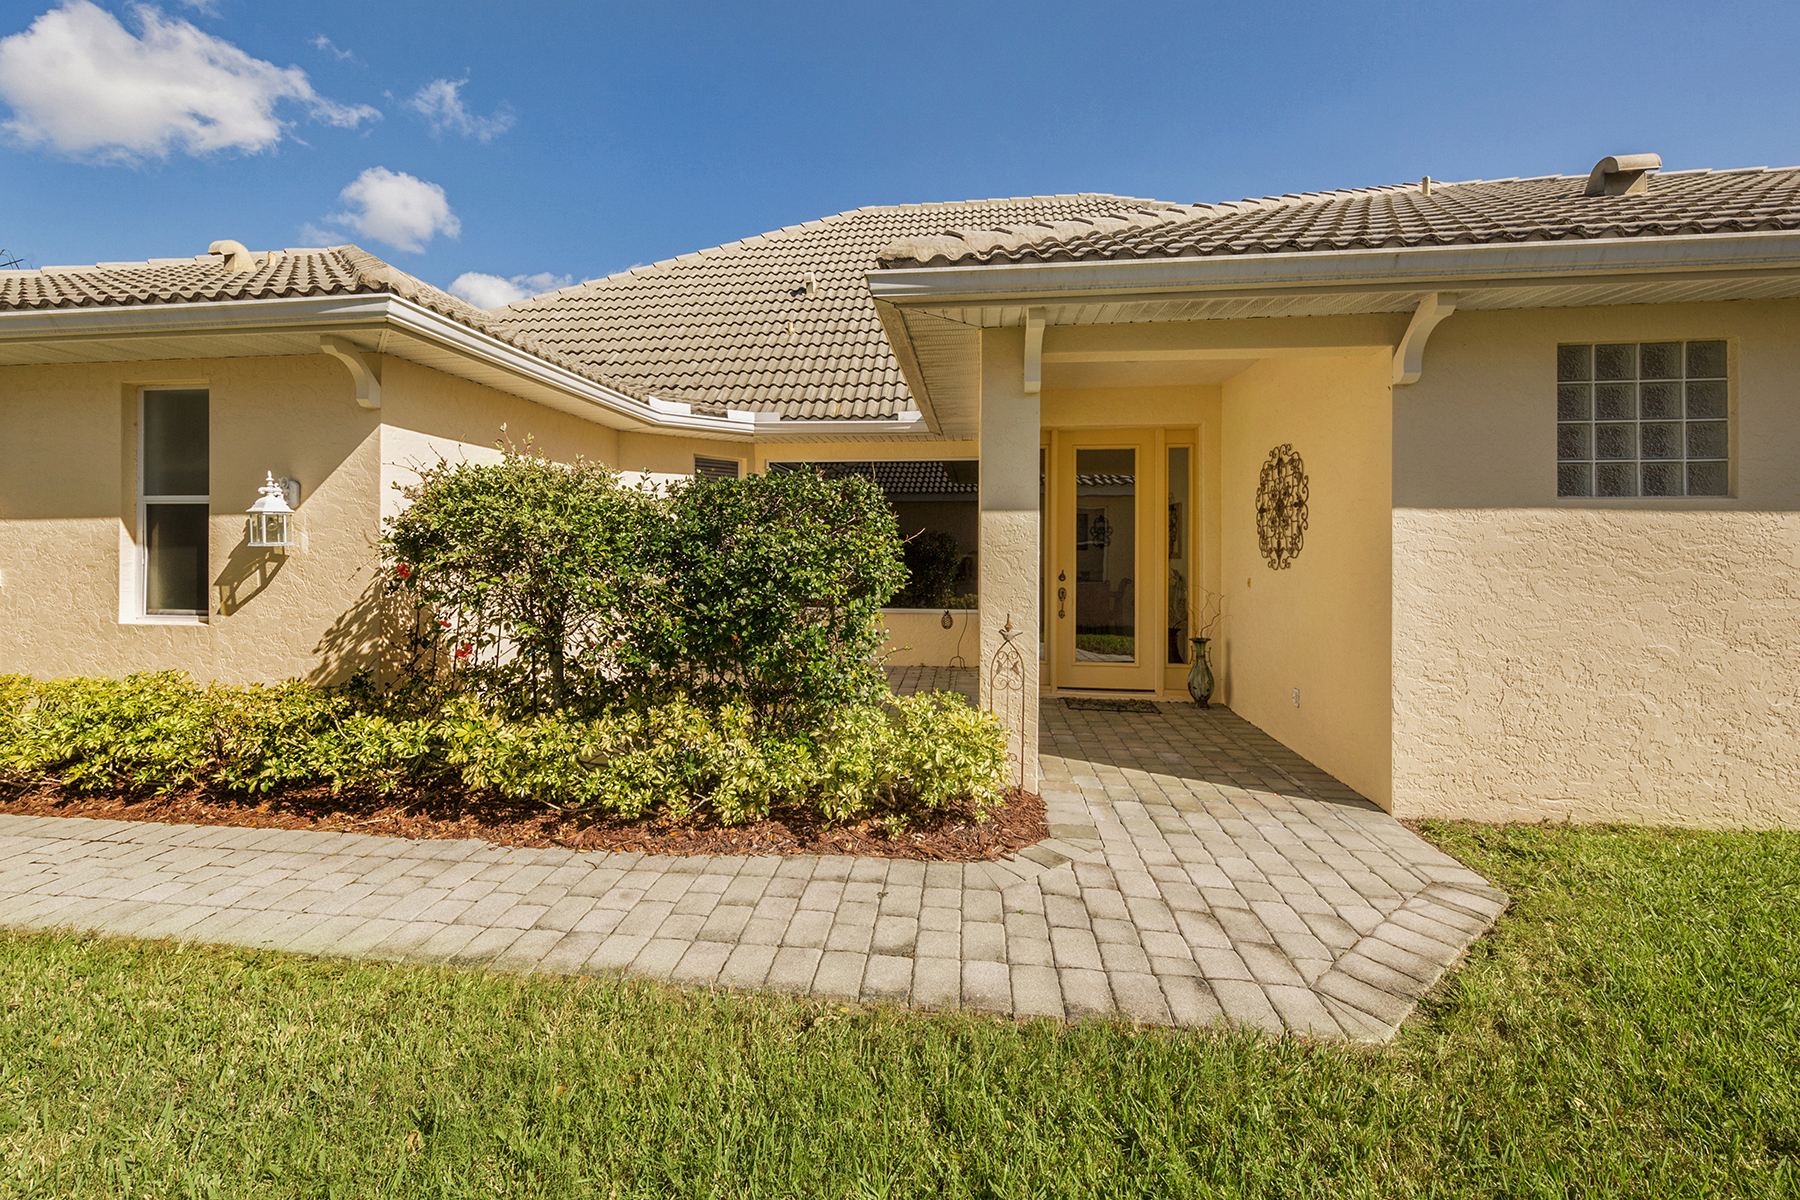 Townhouse for Sale at TALON BAY 8661 Hawk Nest Ln North Port, Florida, 34287 United States